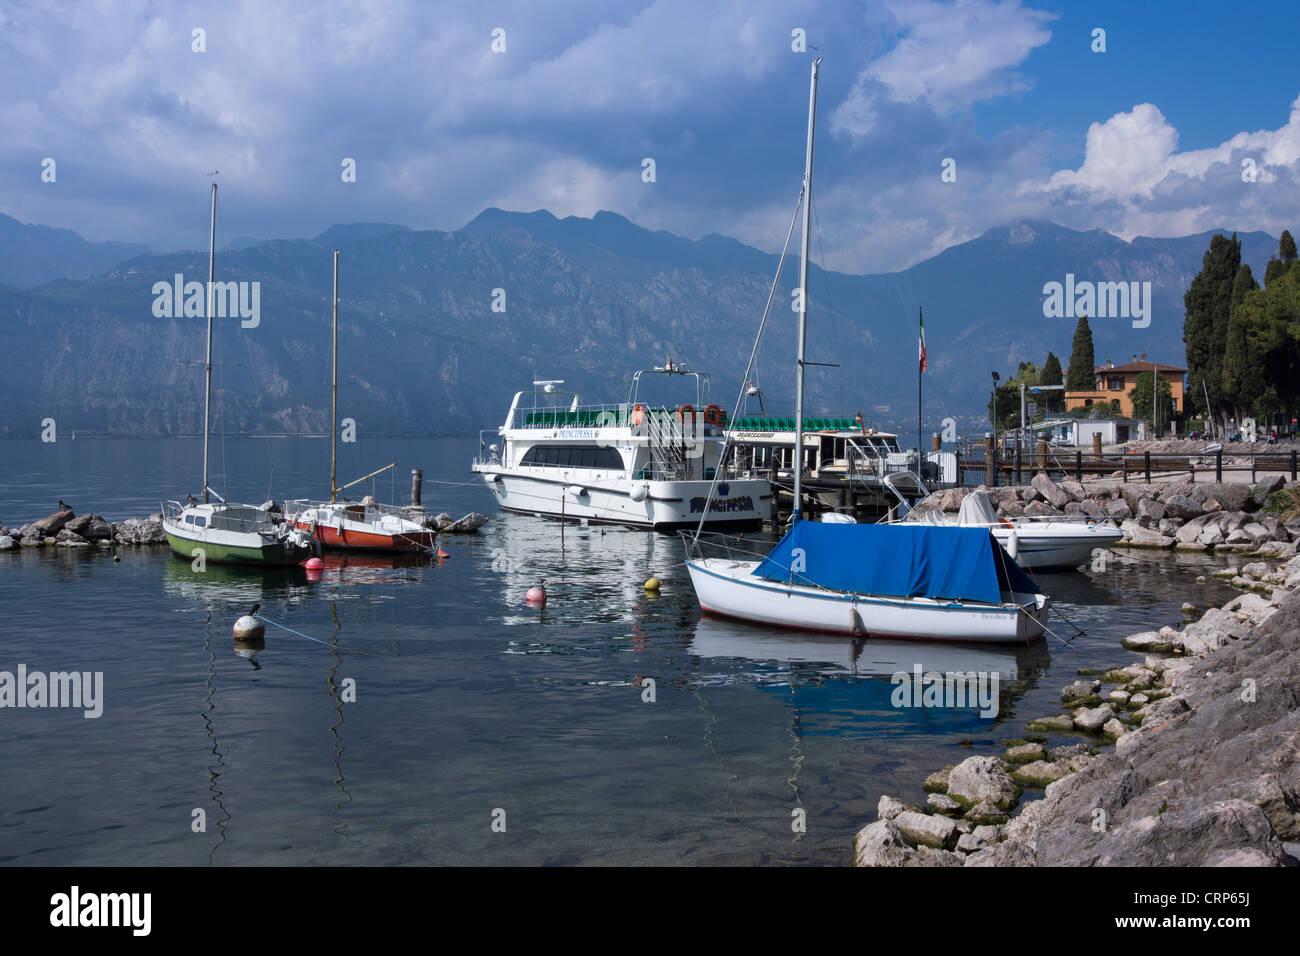 Malcesine, Lake Garda, region Veneto, province Verona, Italy, Europe Stock Photo